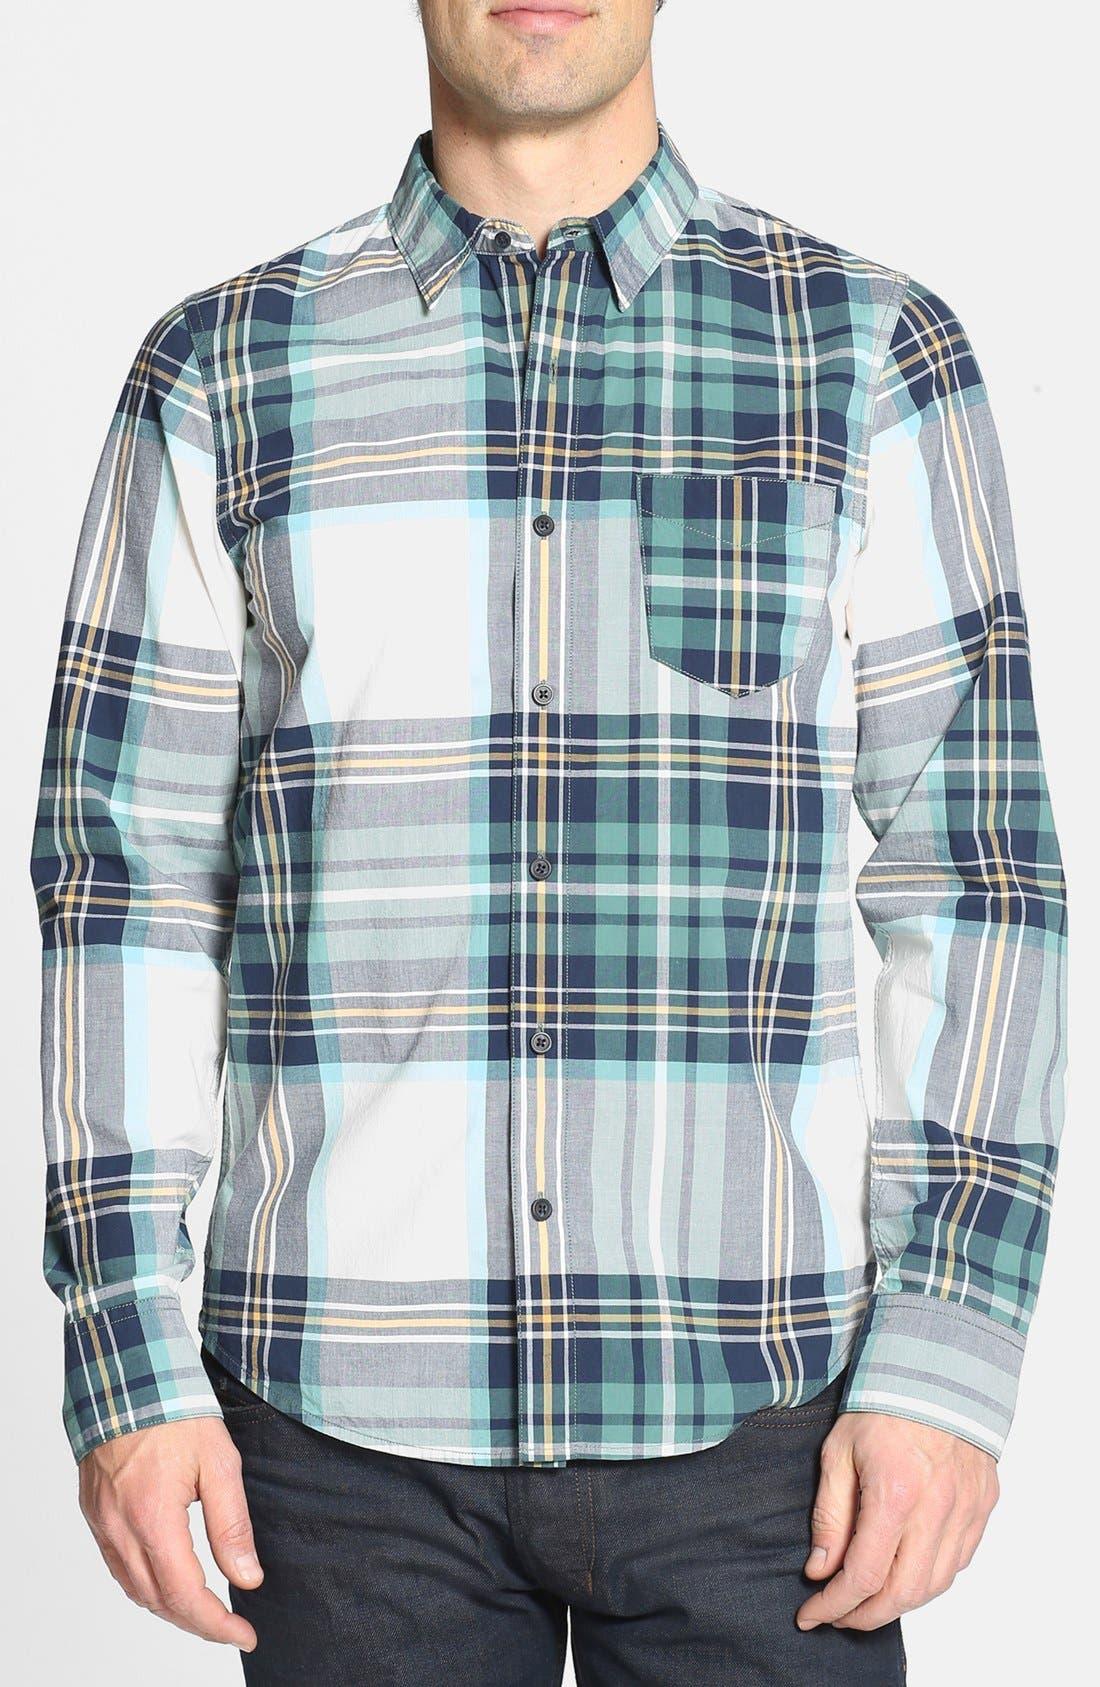 Alternate Image 1 Selected - 1901 Plaid Poplin Cotton Shirt